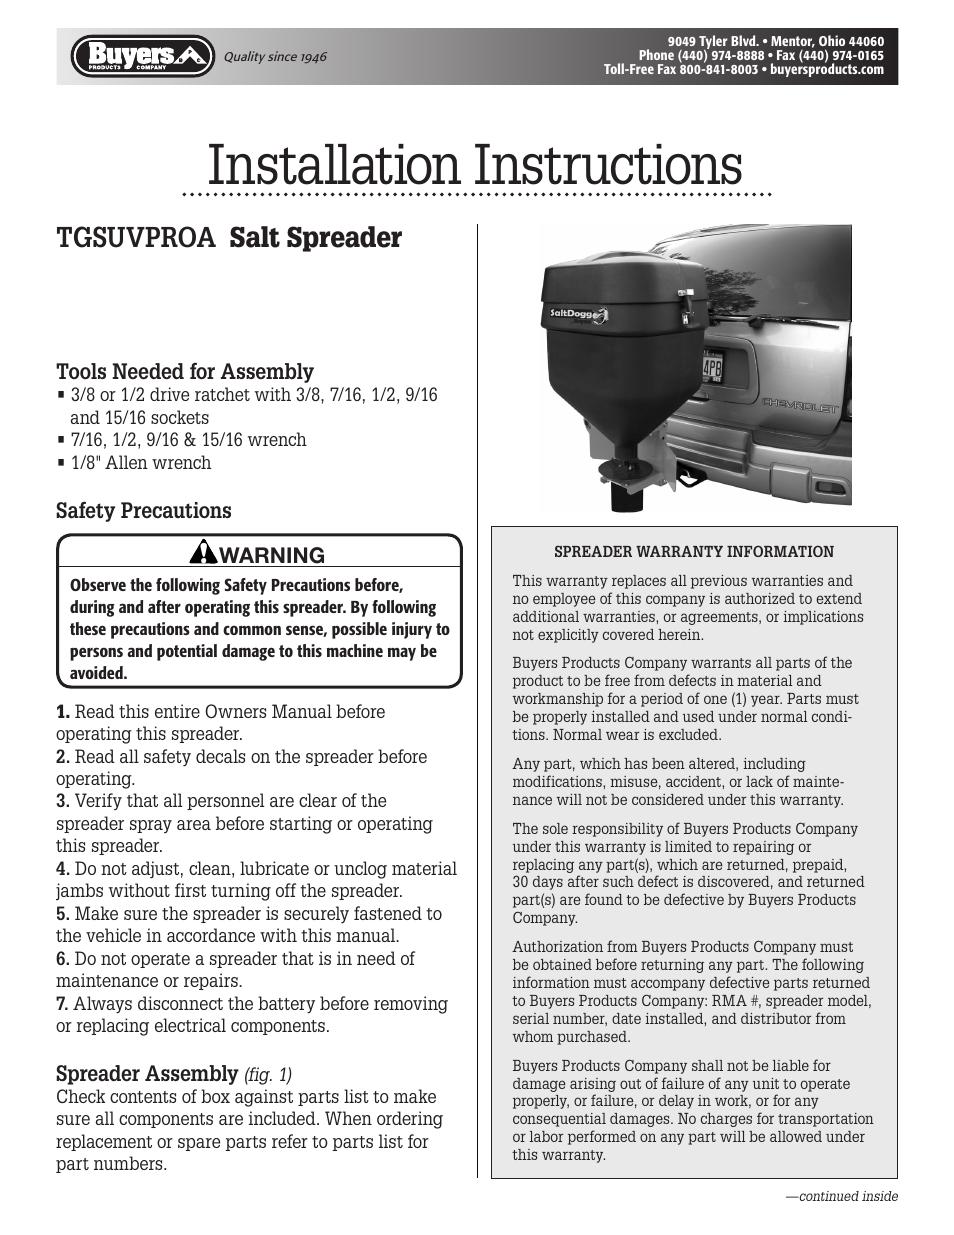 Saltdogg Tgsuvproa Salt Spreader User Manual 4 Pages Tailgate Wiring Diagram